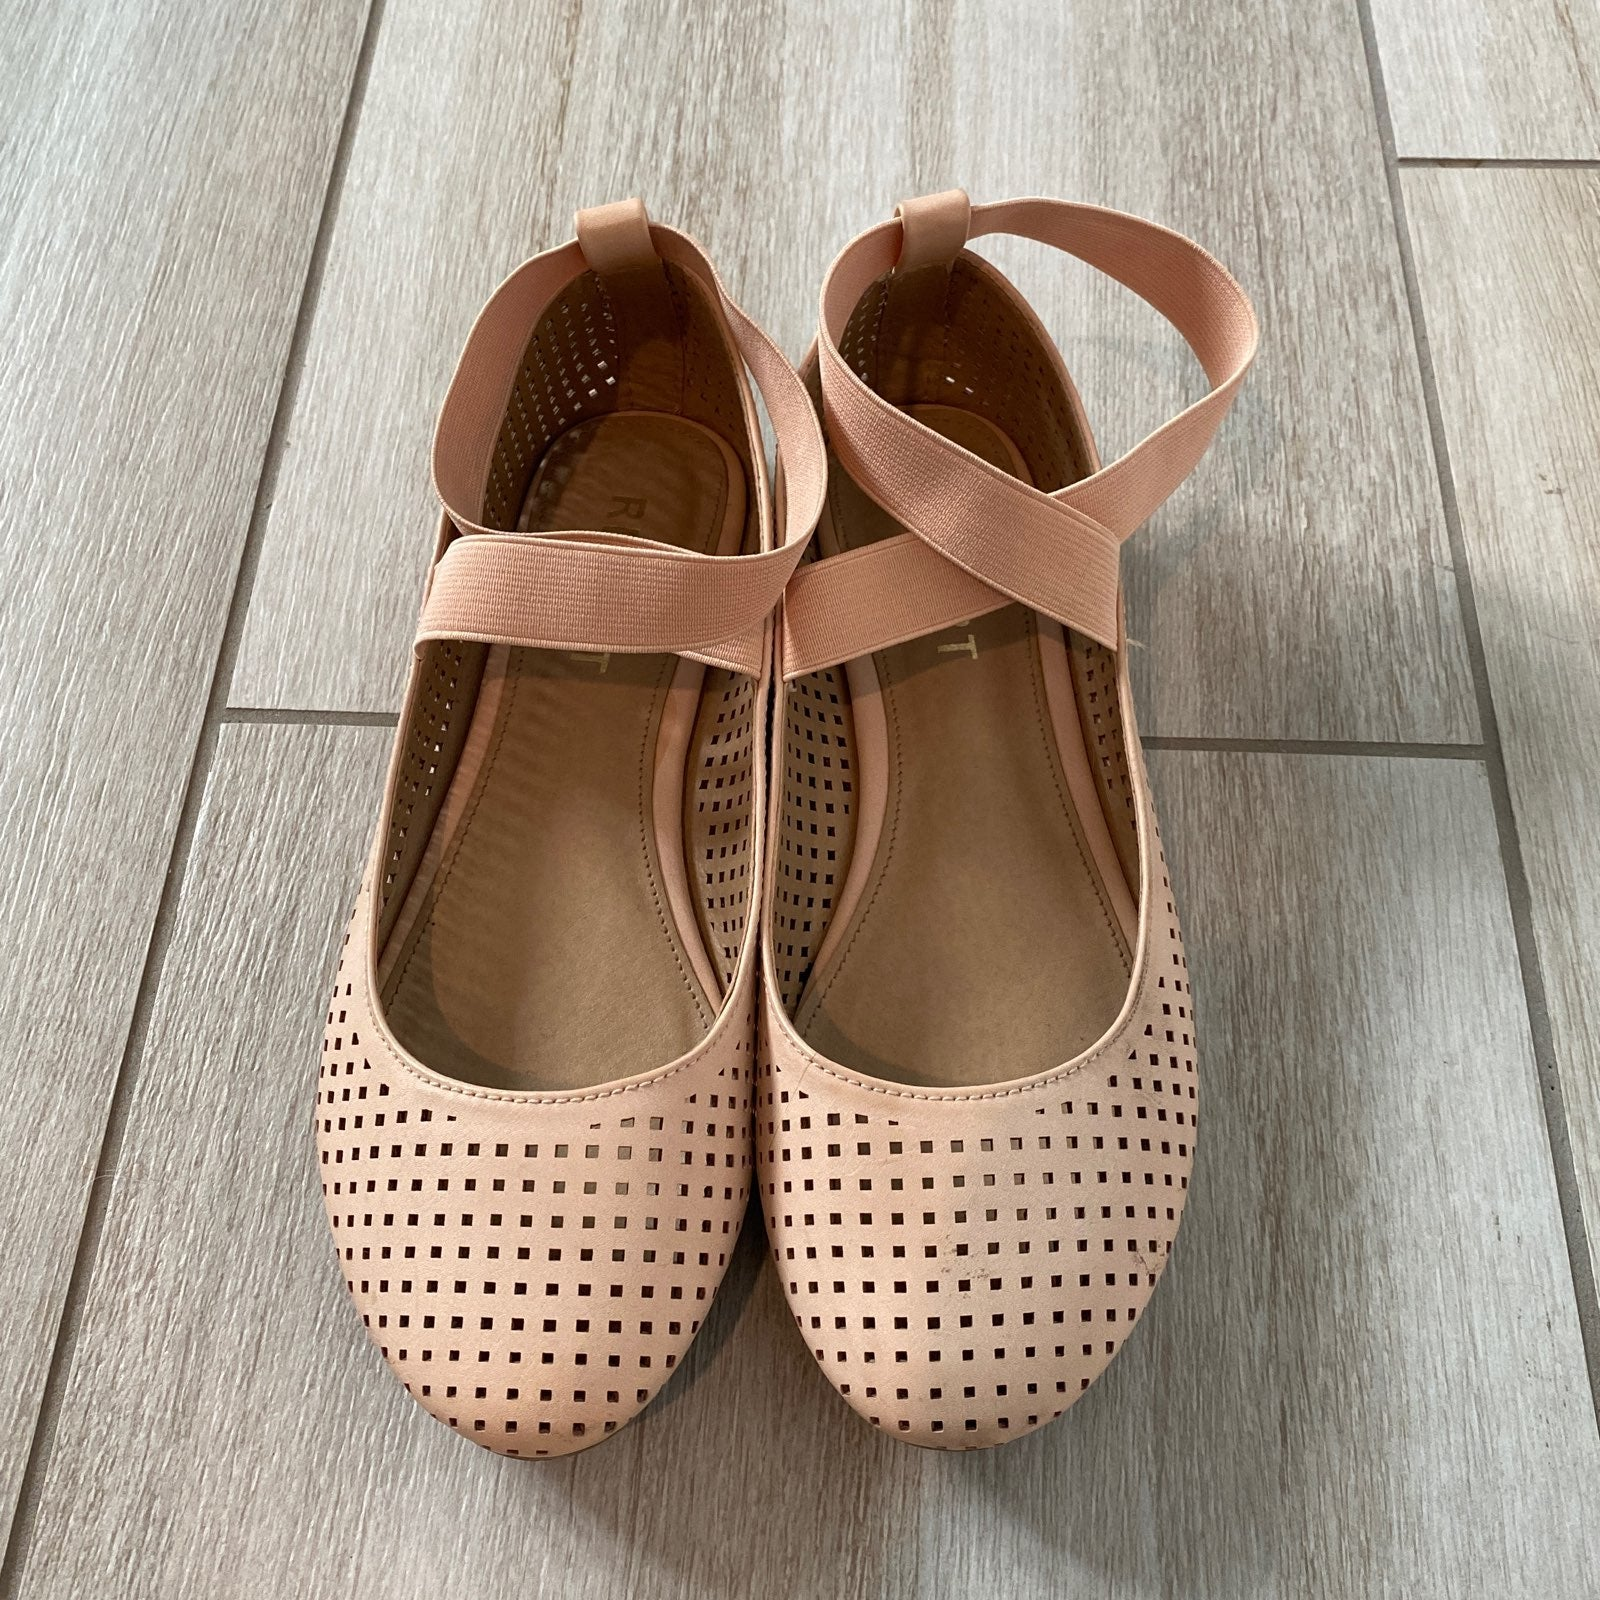 Report ballet flats size 8.5 stitchfix